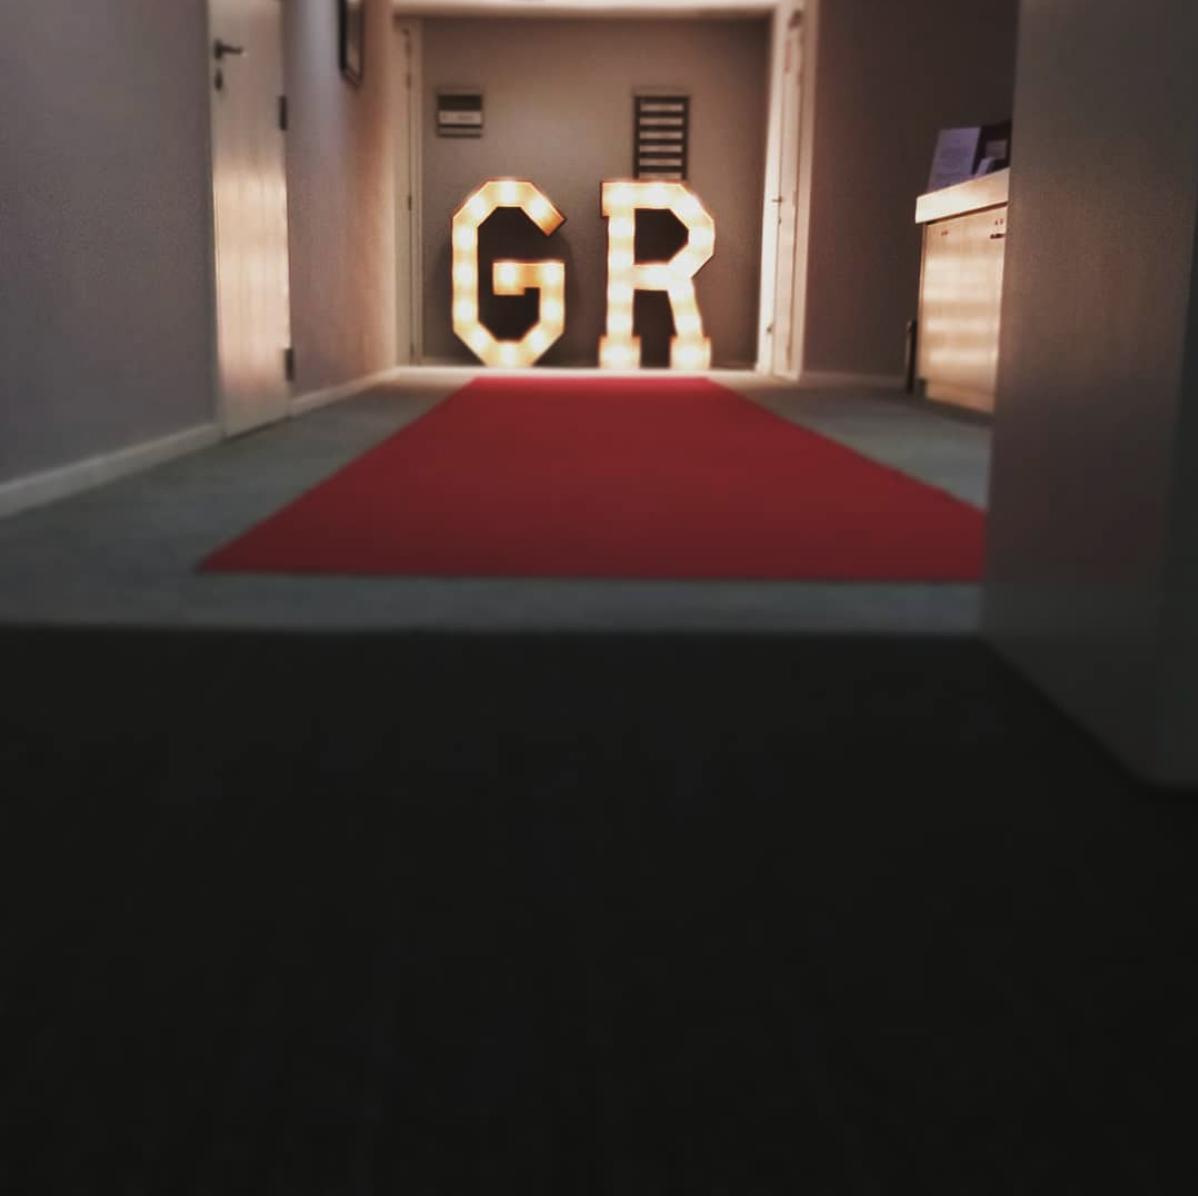 Flashletters -GR